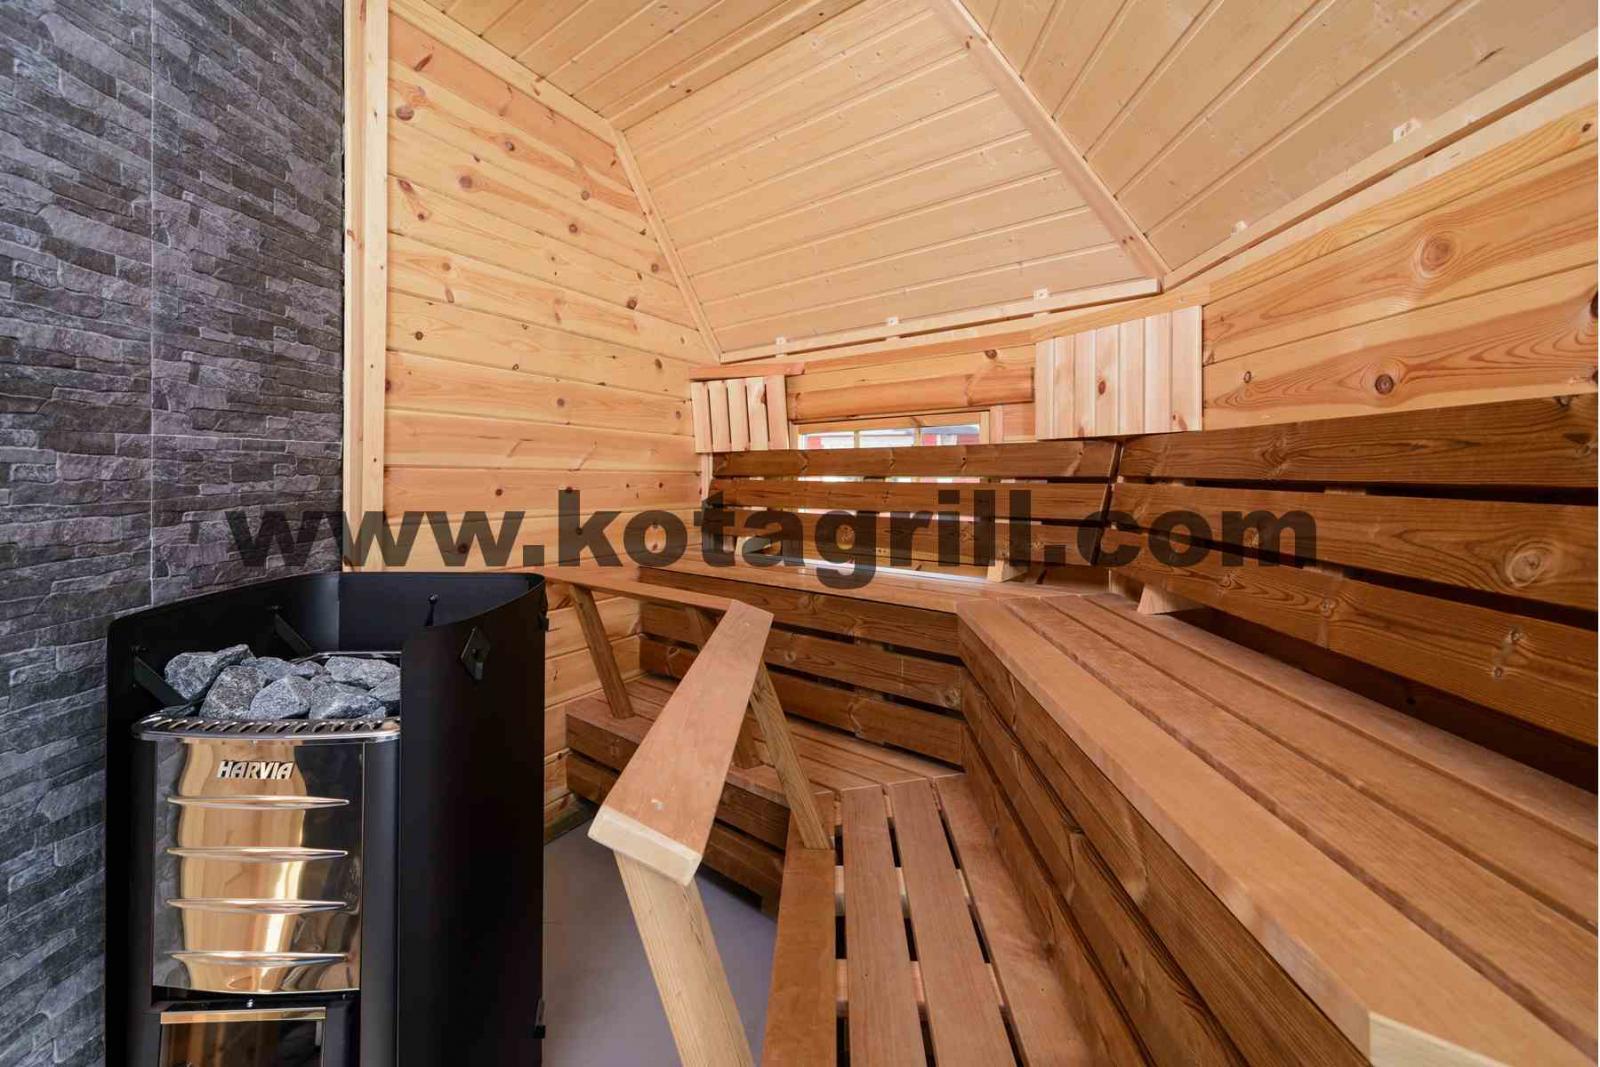 Construire Un Sauna Finlandais sauna finlandais - grill et chalets finlandais - kota grill